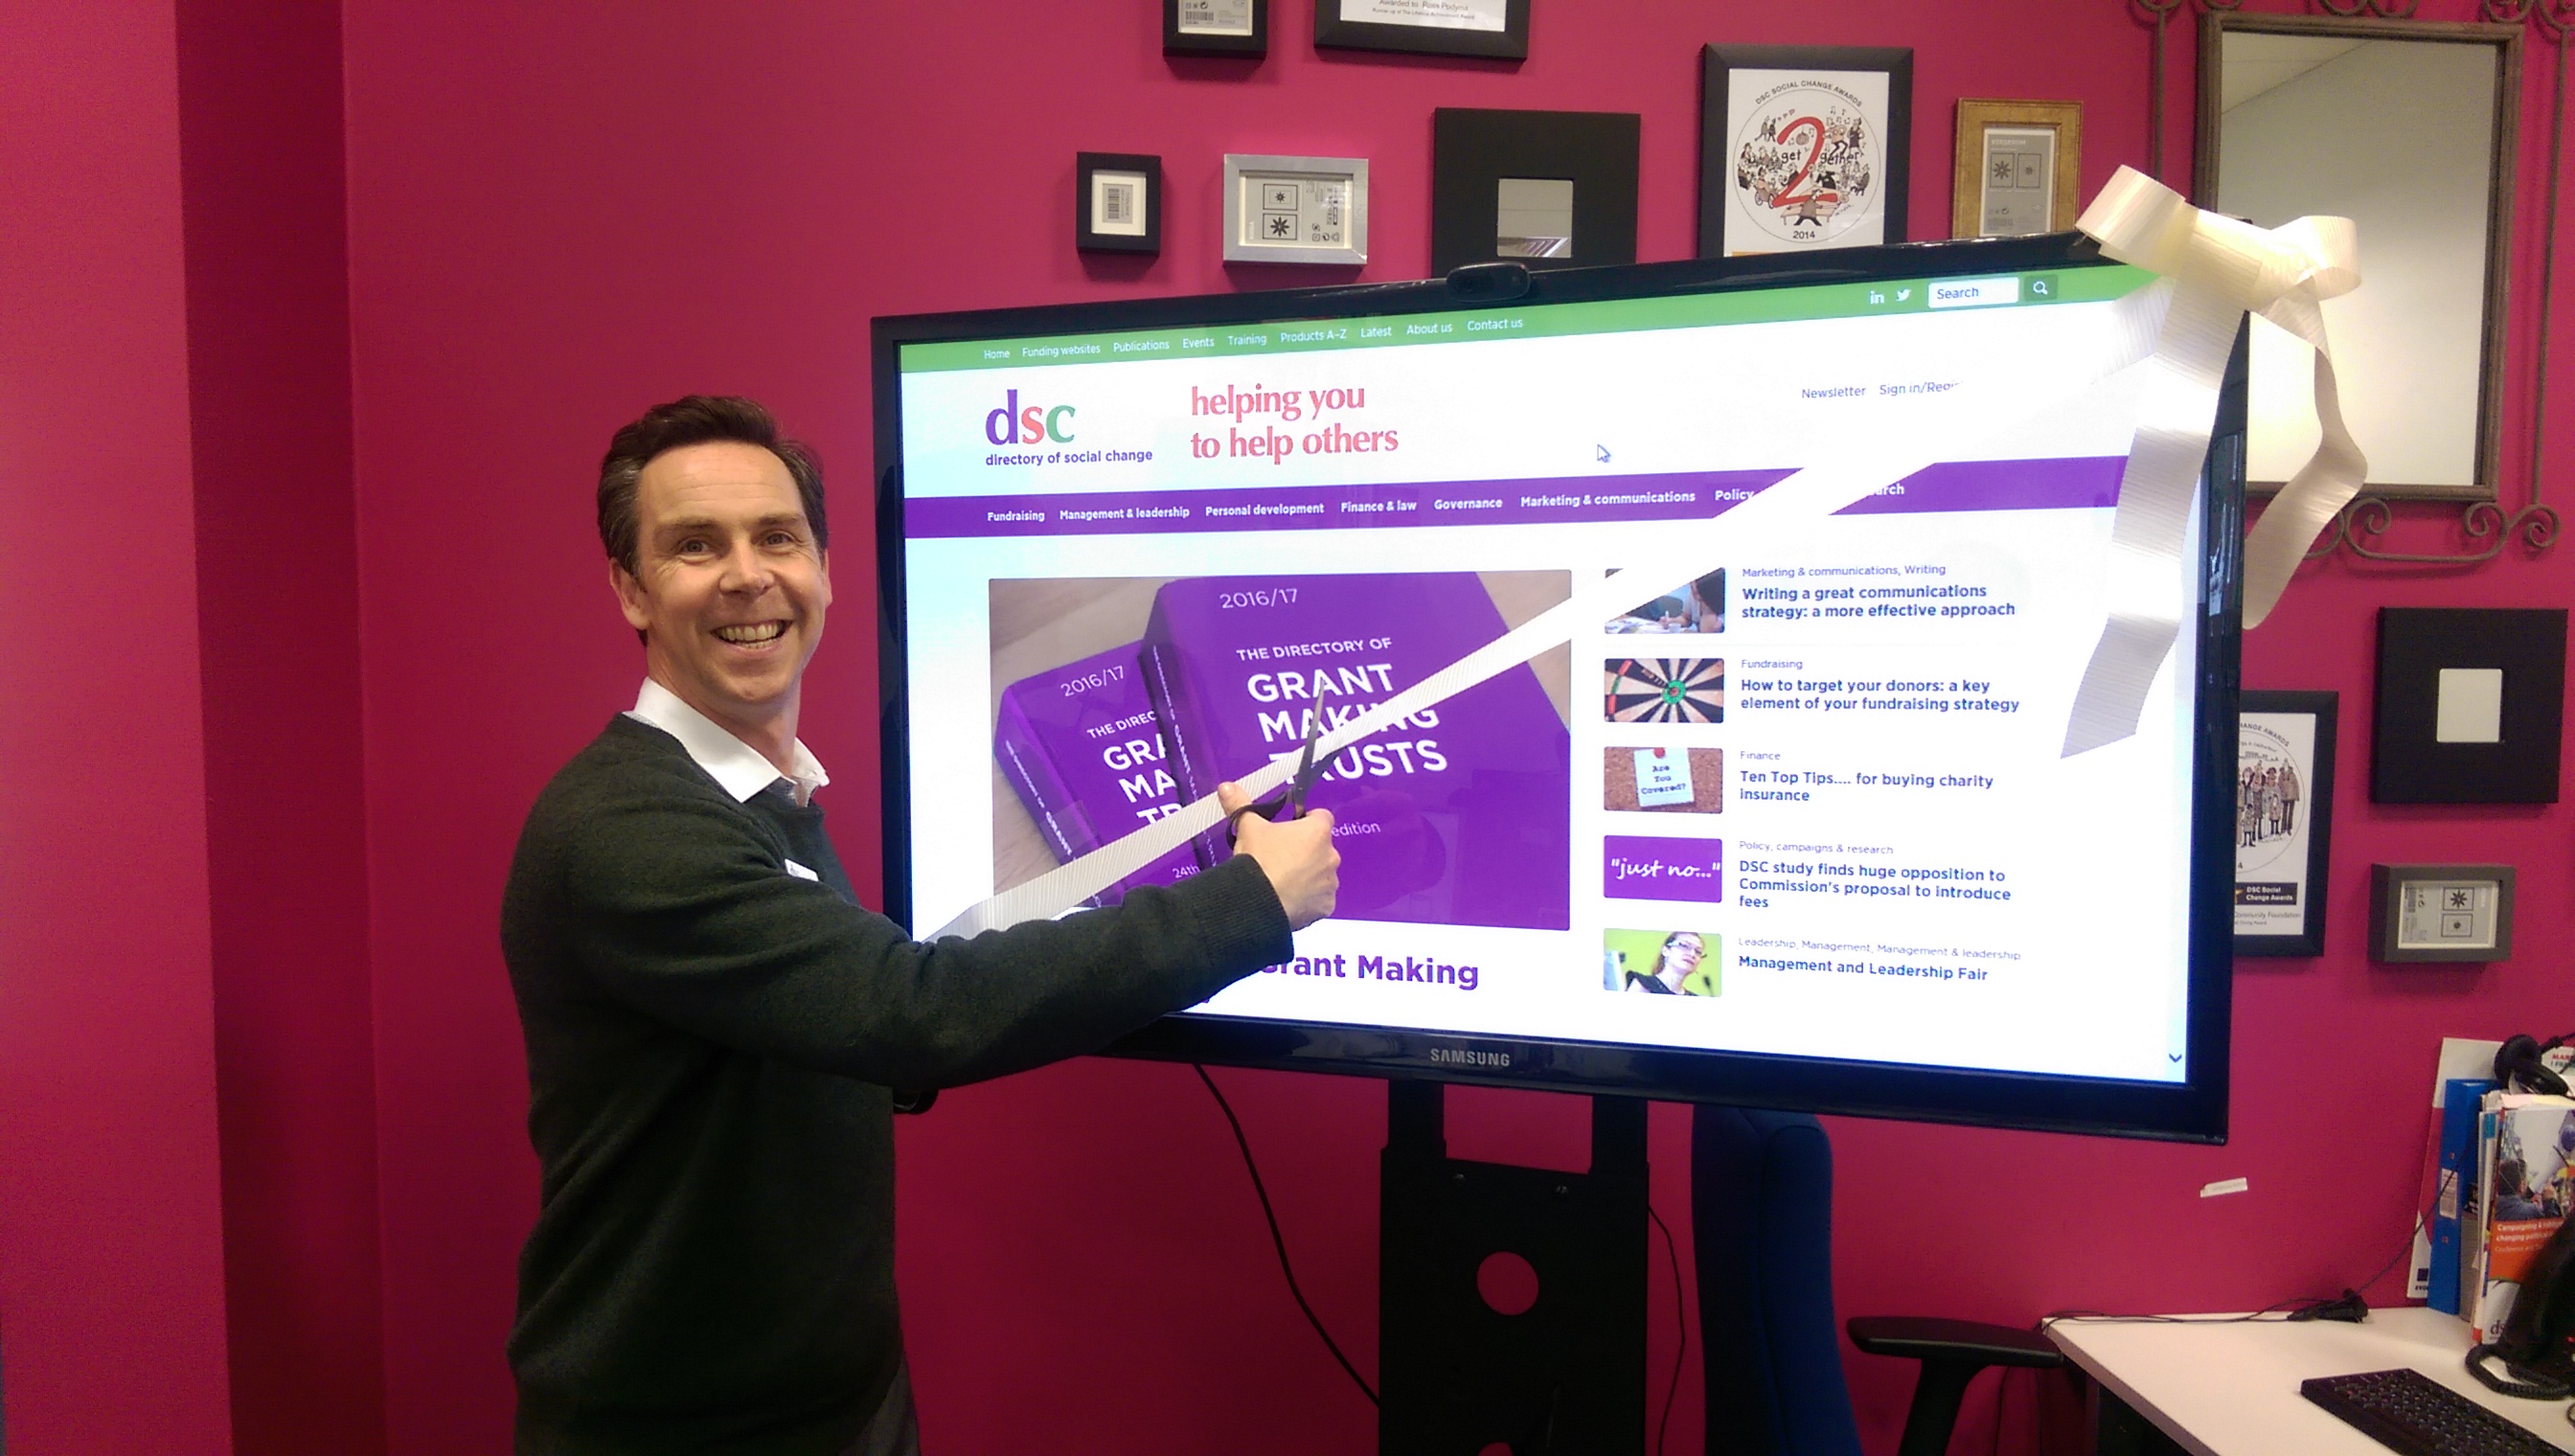 DSC's Marketing Director cuts the ribbon on the new DSC website